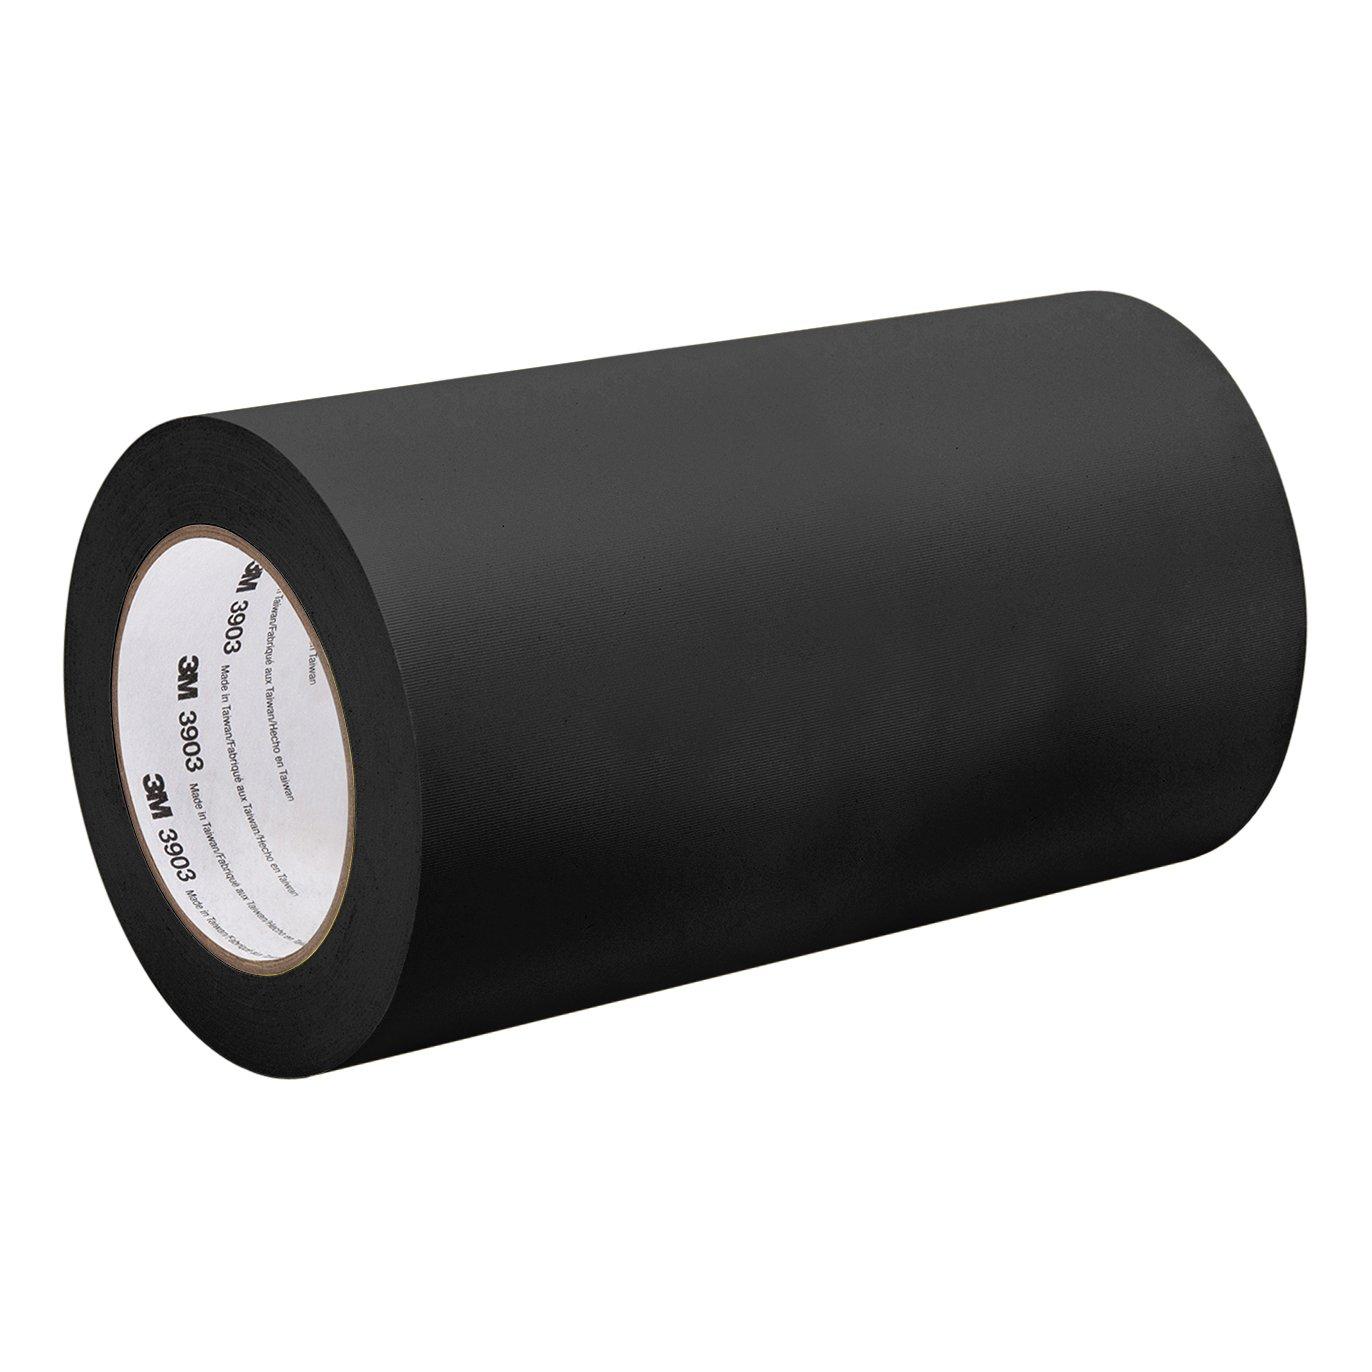 3M Black Vinyl/Rubber Adhesive Duct Tape 3903, 15-50-3903-BLACK 12.6 psi Tensile Strength, 50 yd. Length, 15